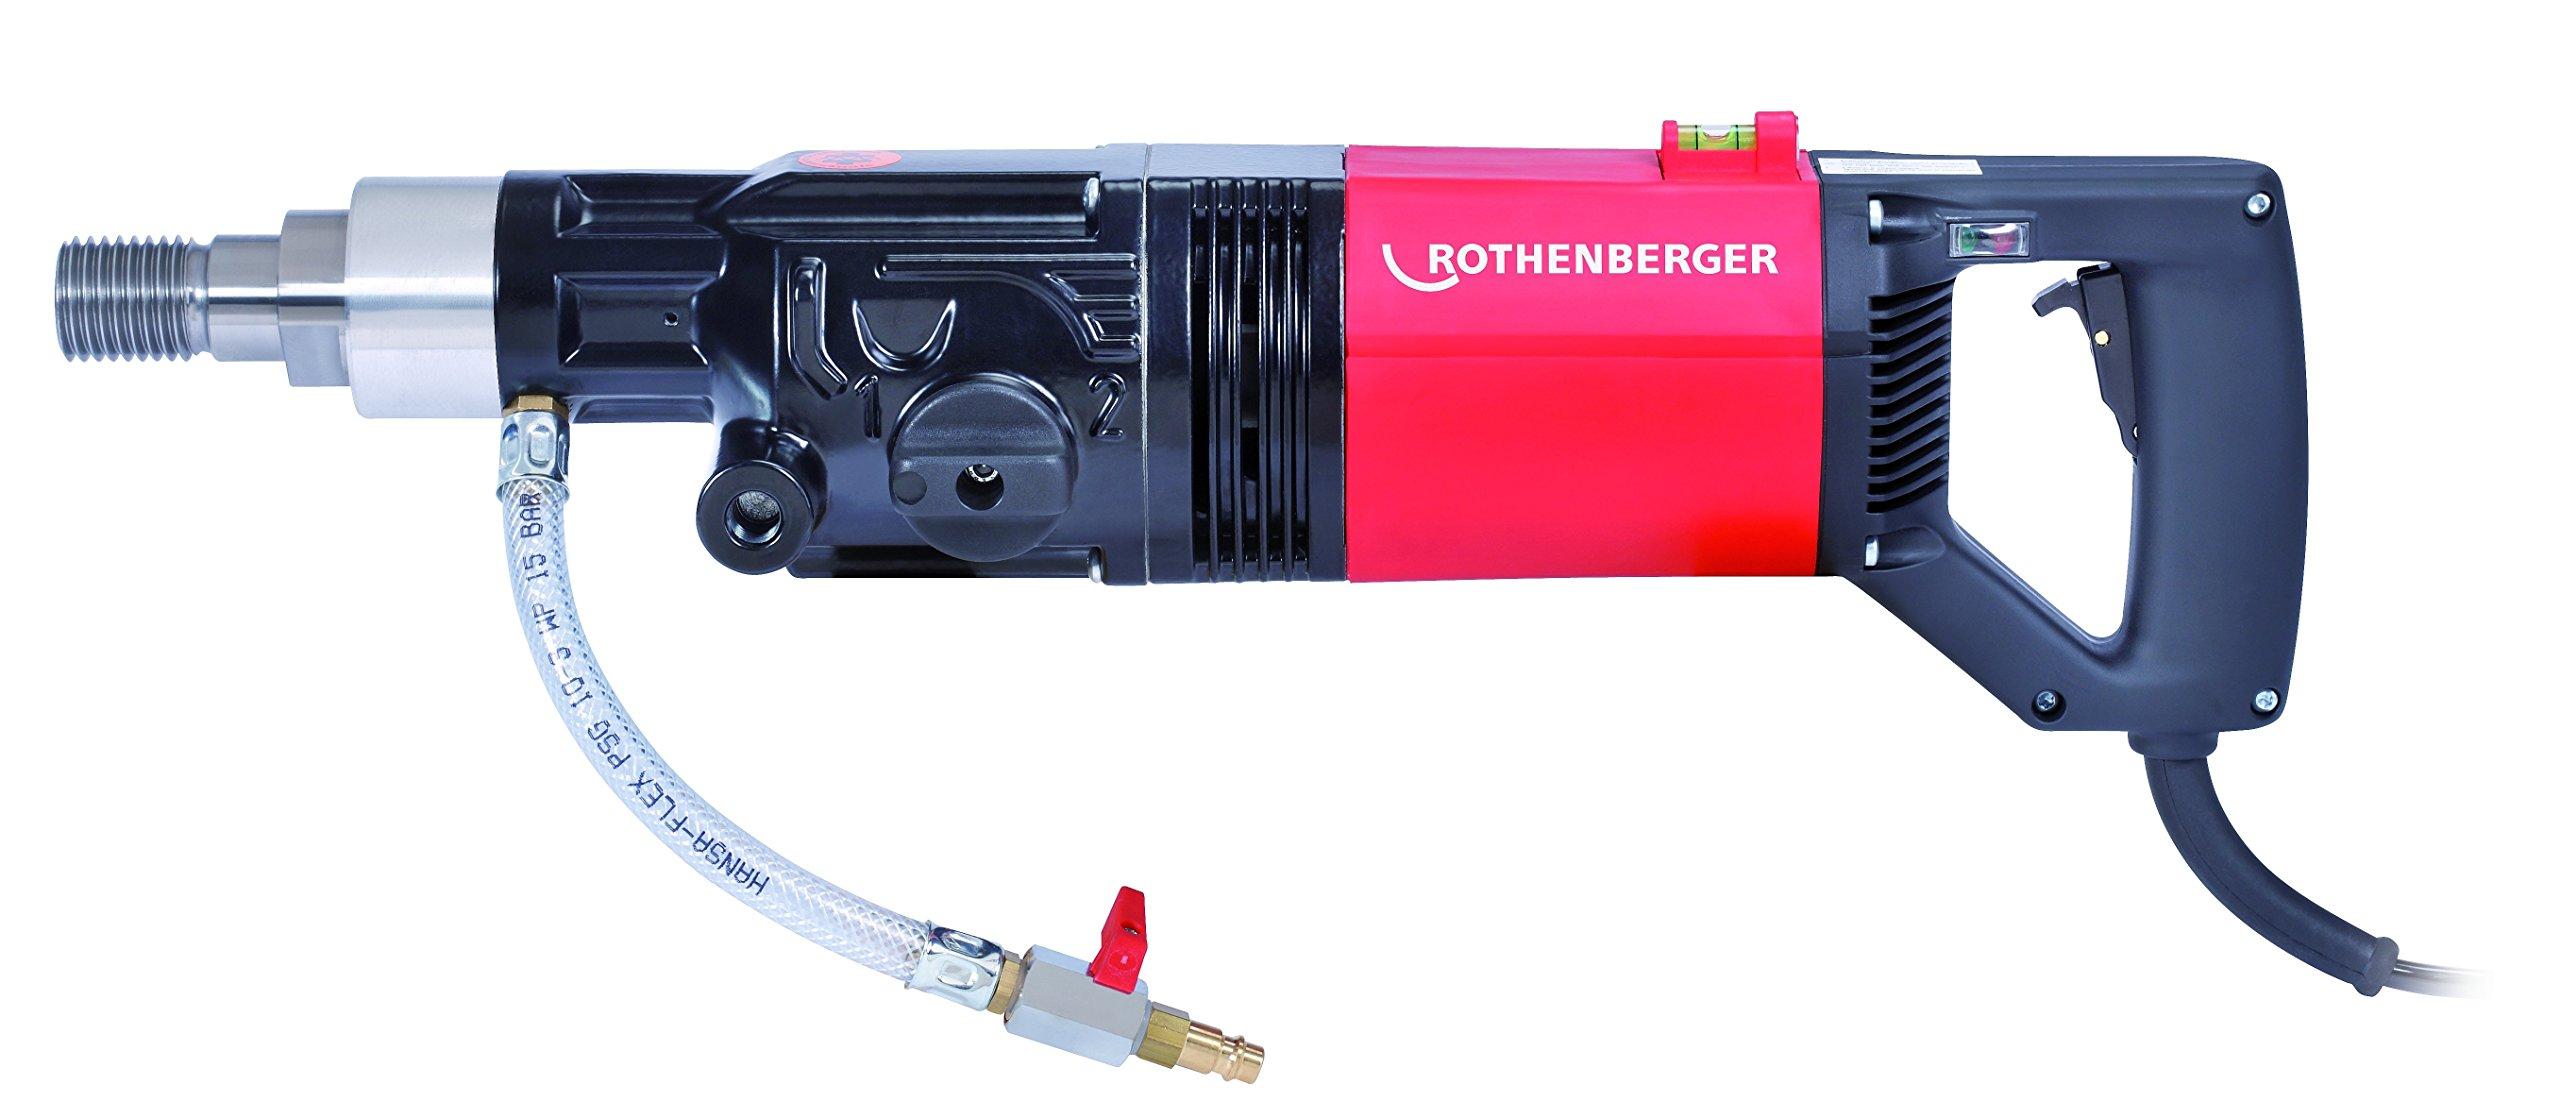 Rothenberger-Diamant-Handbohrmaschine-Rodiadrill-1800-DWS-1-Stck-FF40180